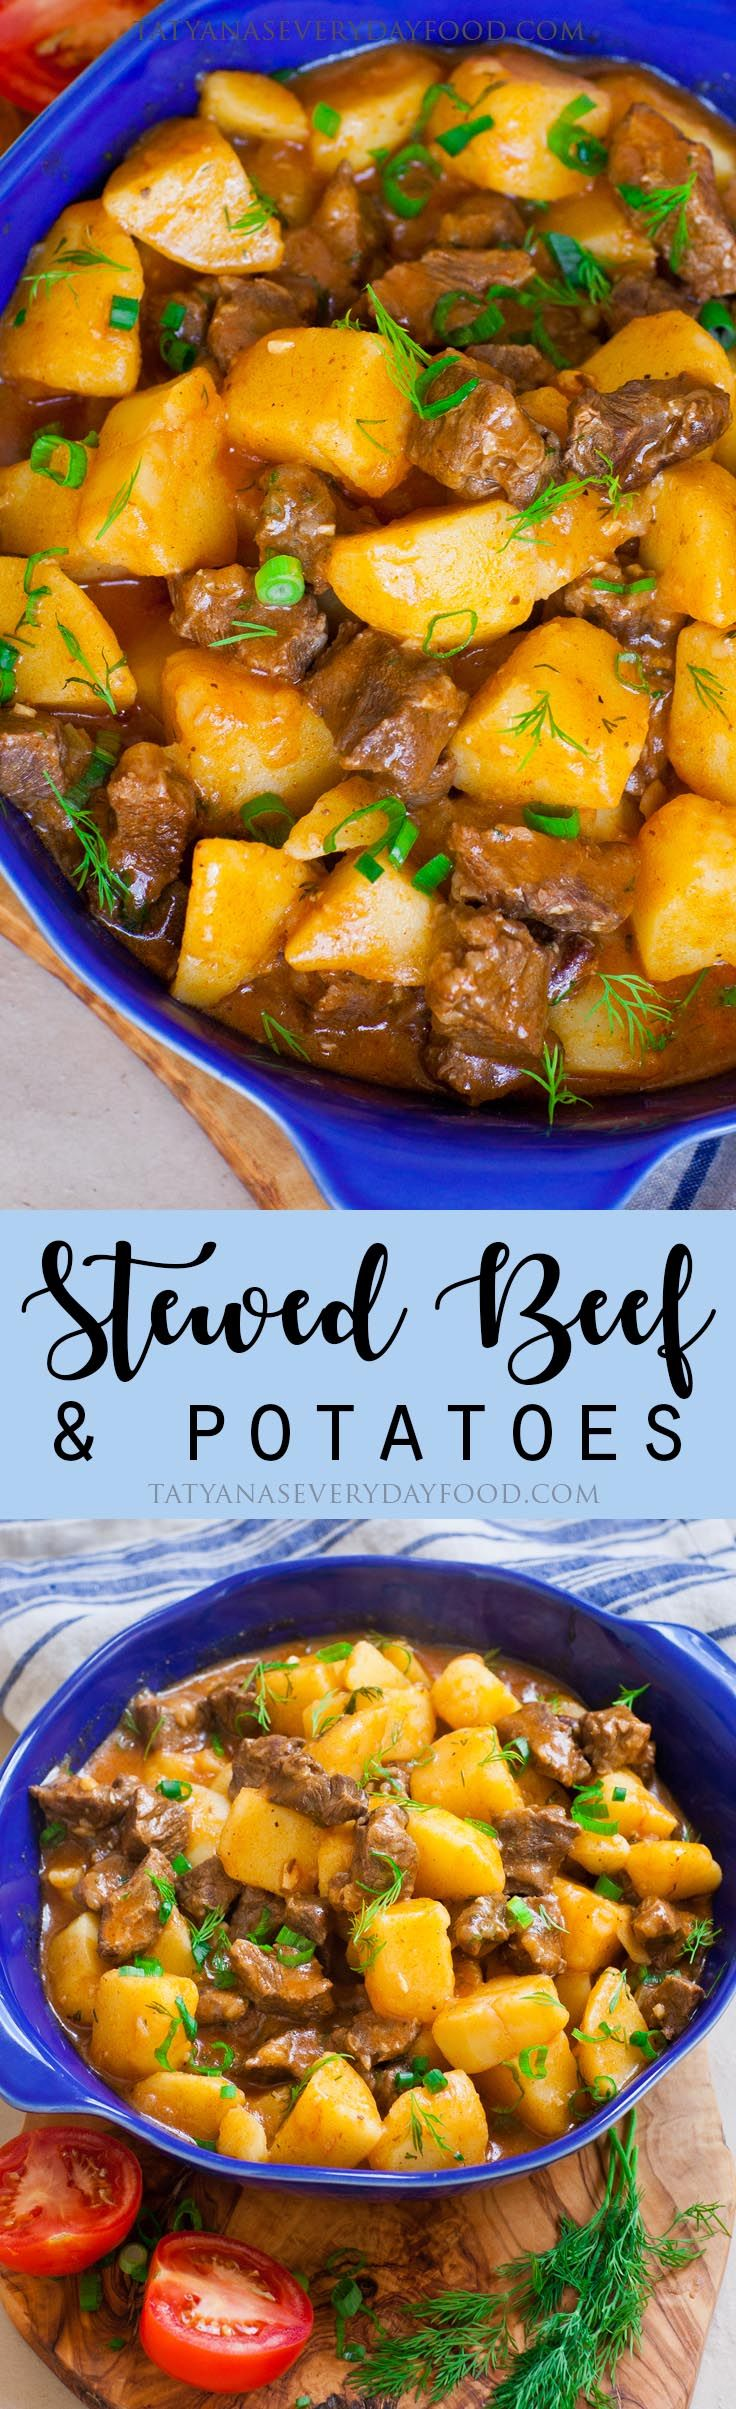 Ukrainian Stewed Beef Potatoes Recipe Video Tatyanas Everyday Food Recipe Beef And Potatoes Tatyana S Everyday Food Beef Recipes